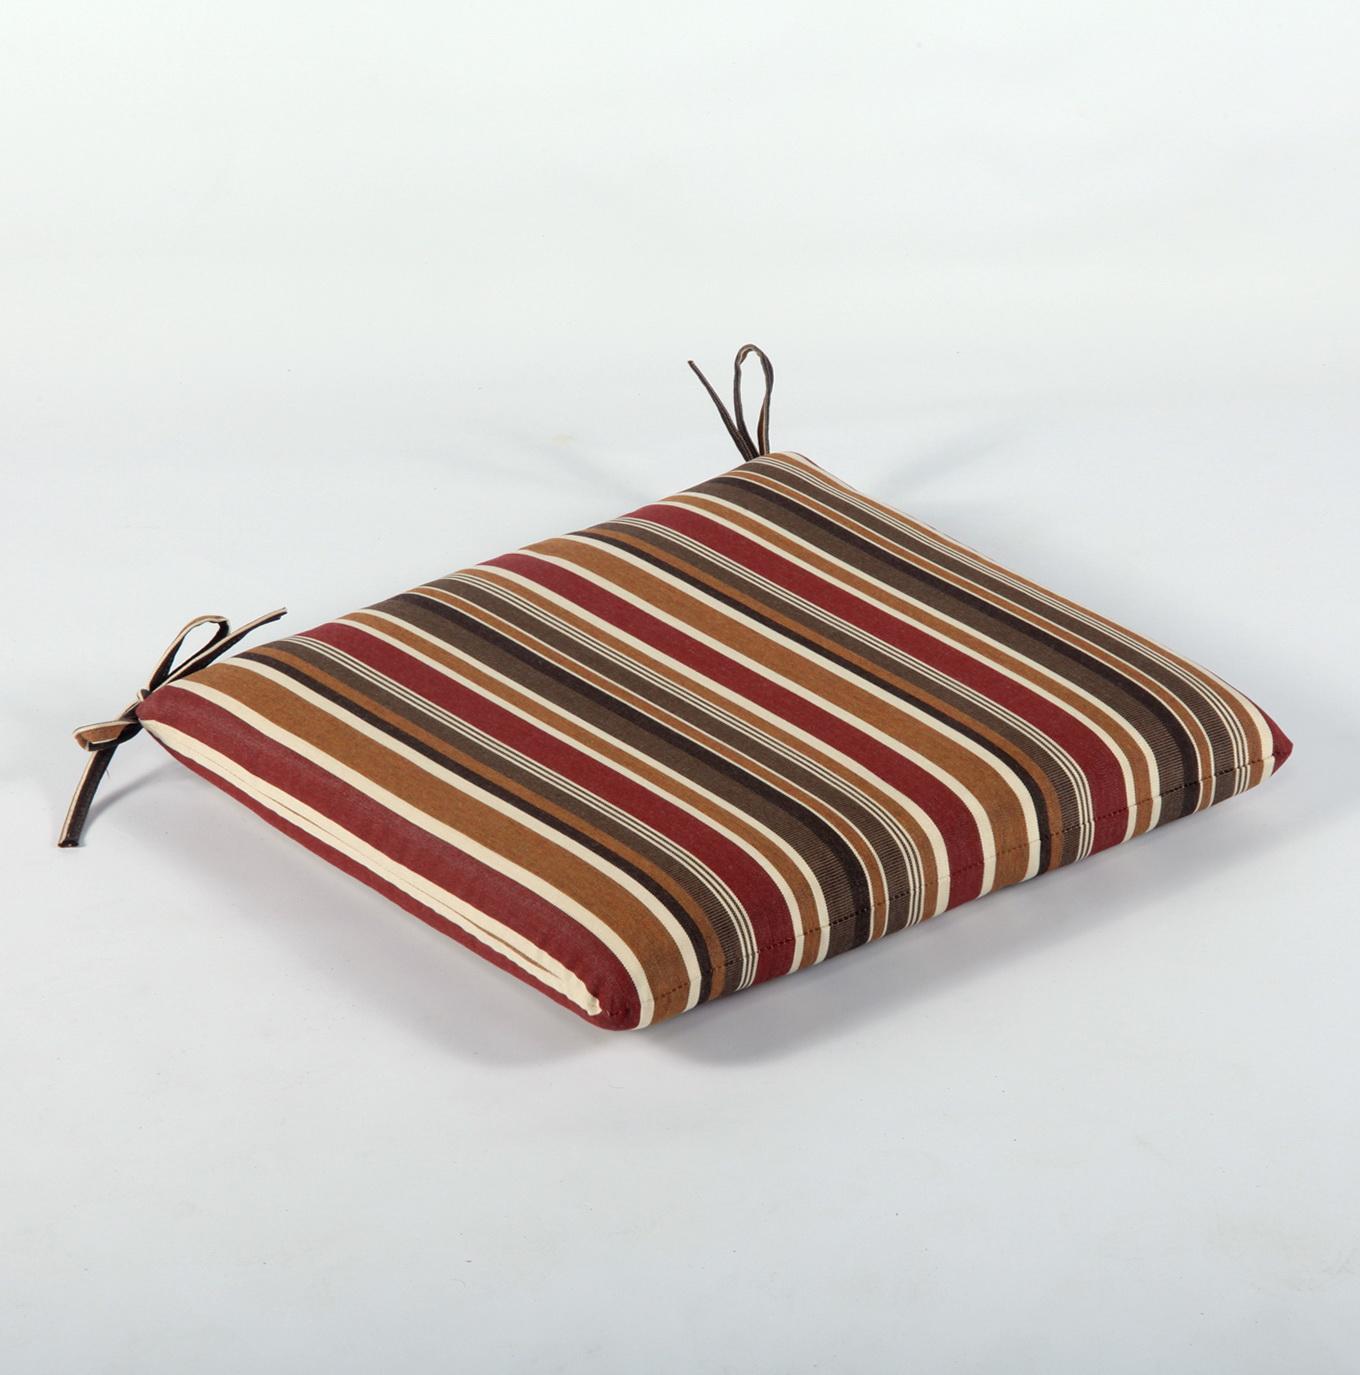 Cushions For Patio Furniture Sunbrella Home Design Ideas